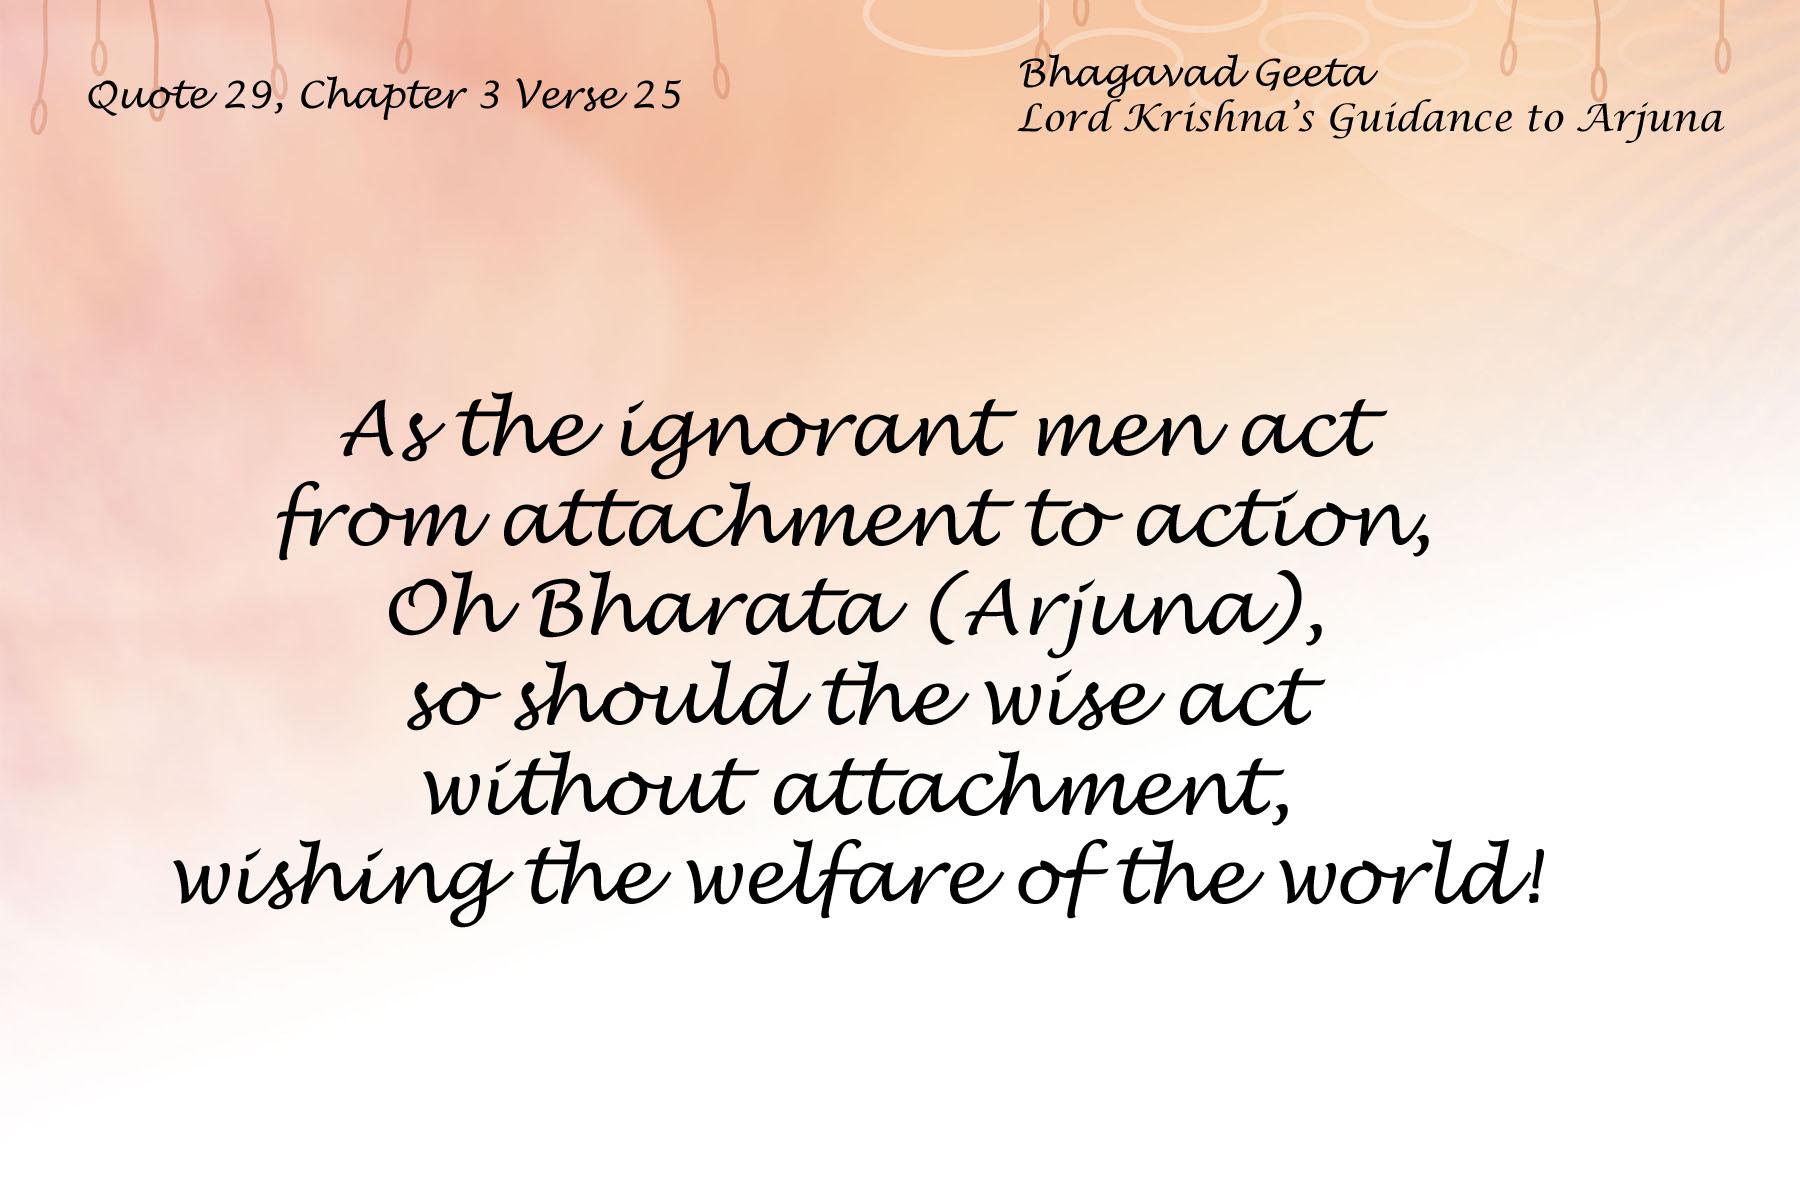 Bhagavad Geeta Chapter 3 Verse 25